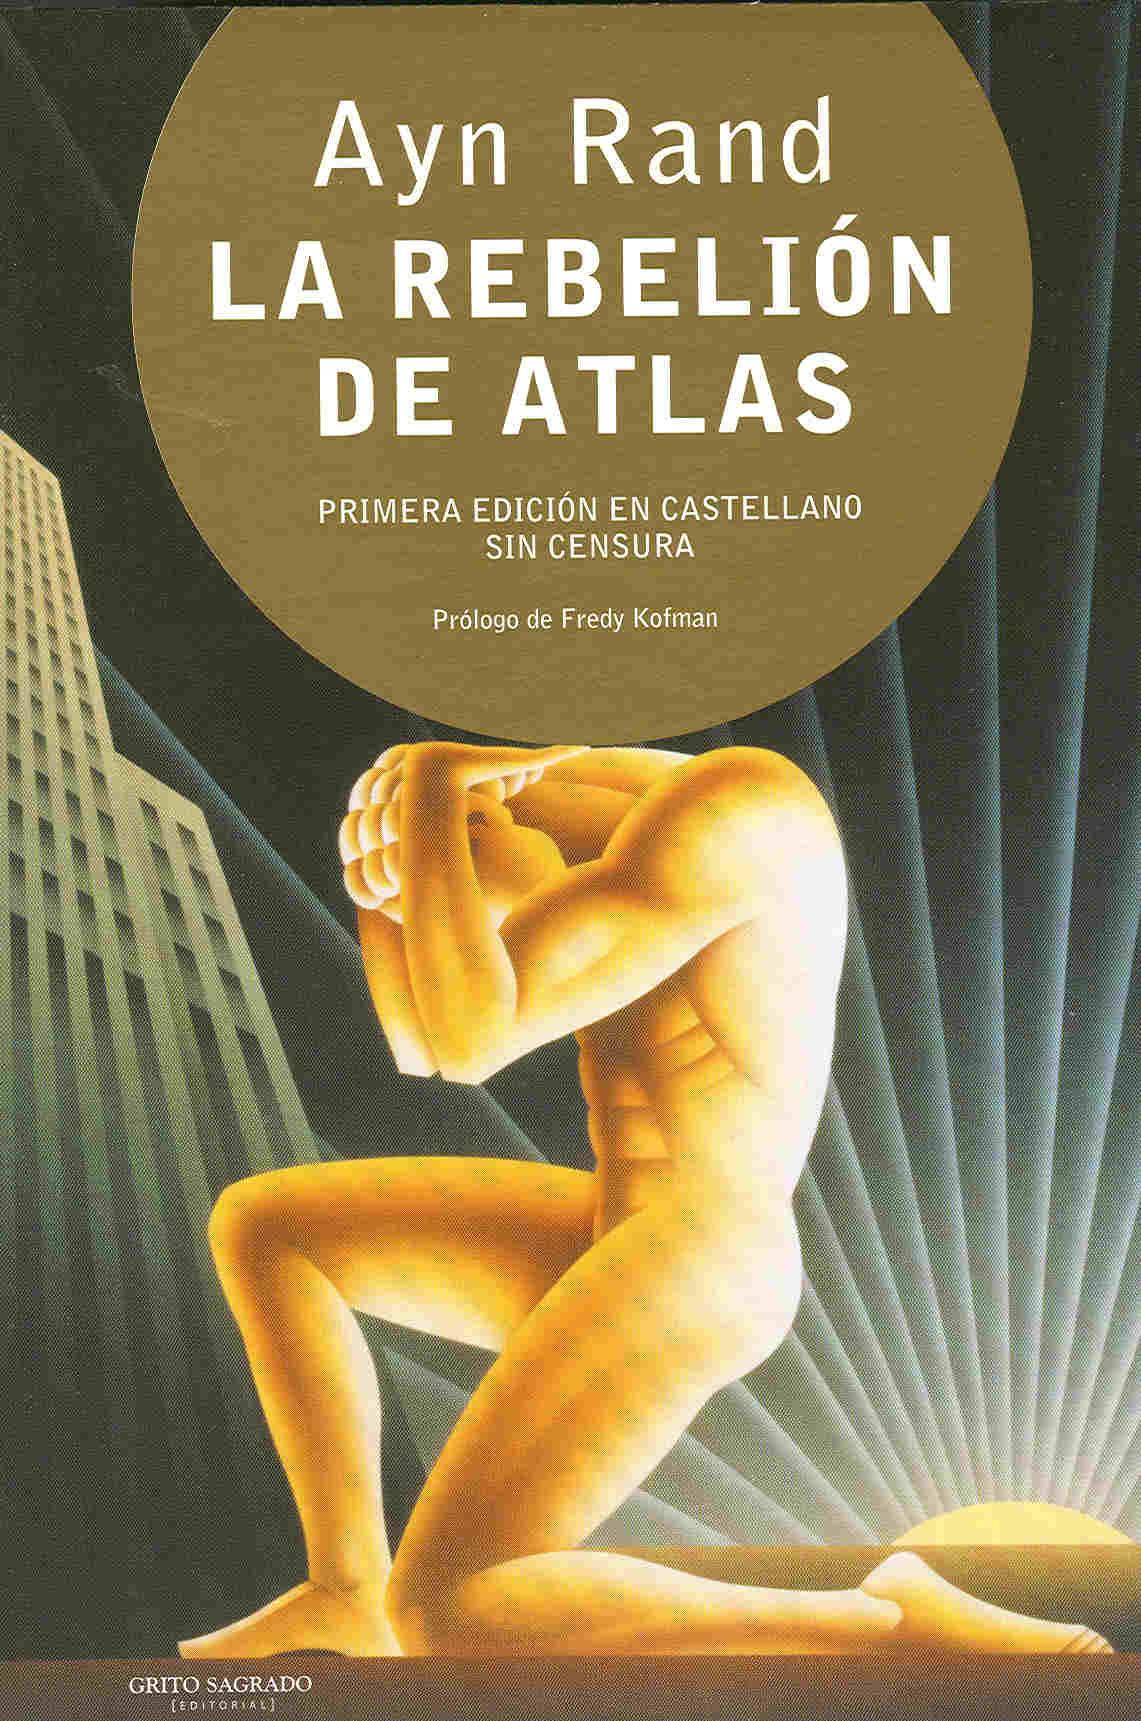 https://i1.wp.com/www.libros-mas-vendidos.com/wp-content/uploads/2012/02/libro-la-rebelion-de-atlas-ayn-rand.jpg